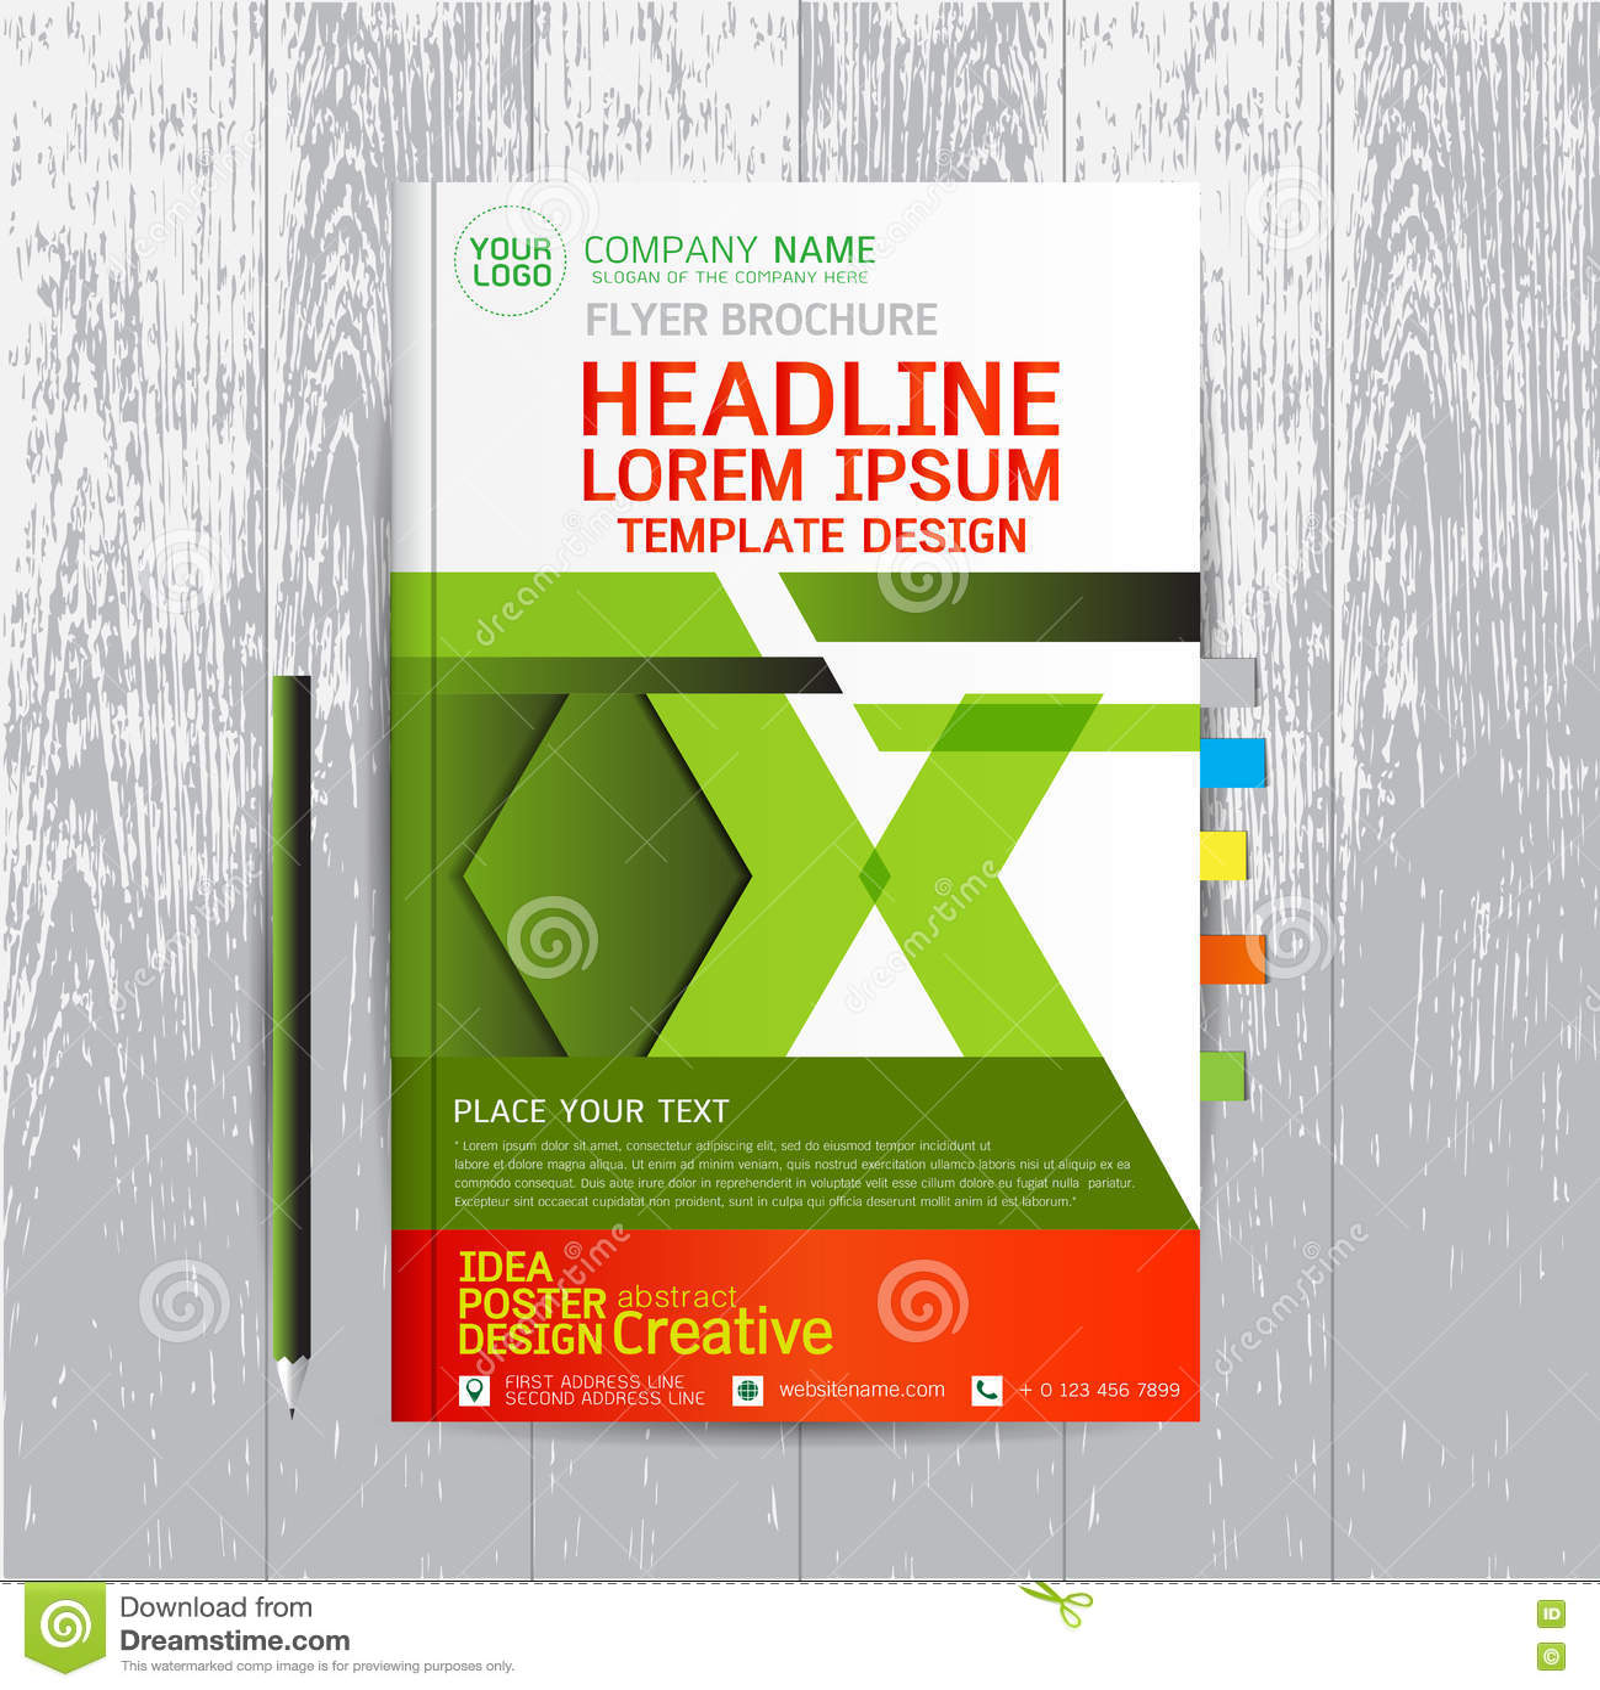 Poster design layout templates - Brochure Flyers Poster Design Layout Template In A4 Size With Stock Vector